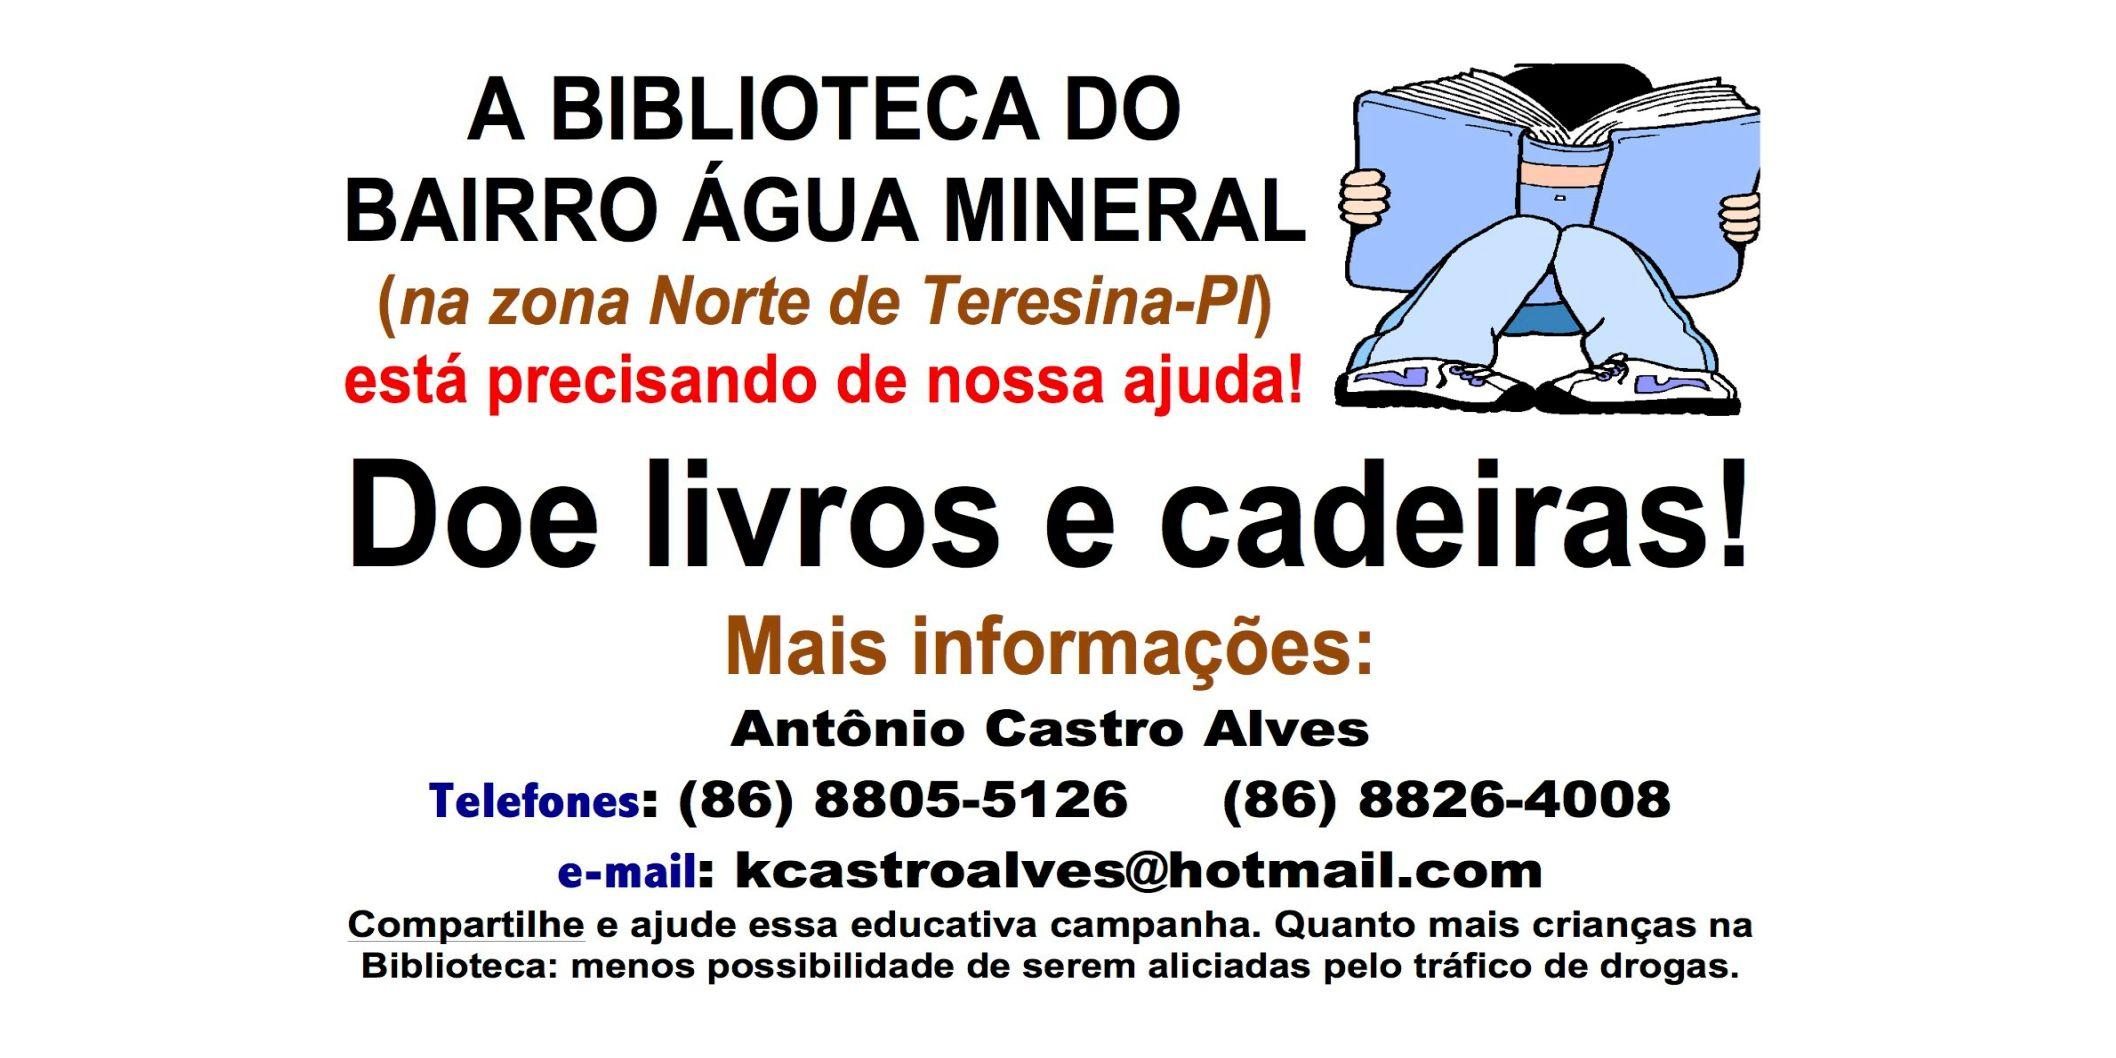 Biblioteca do bairro Água Mineral